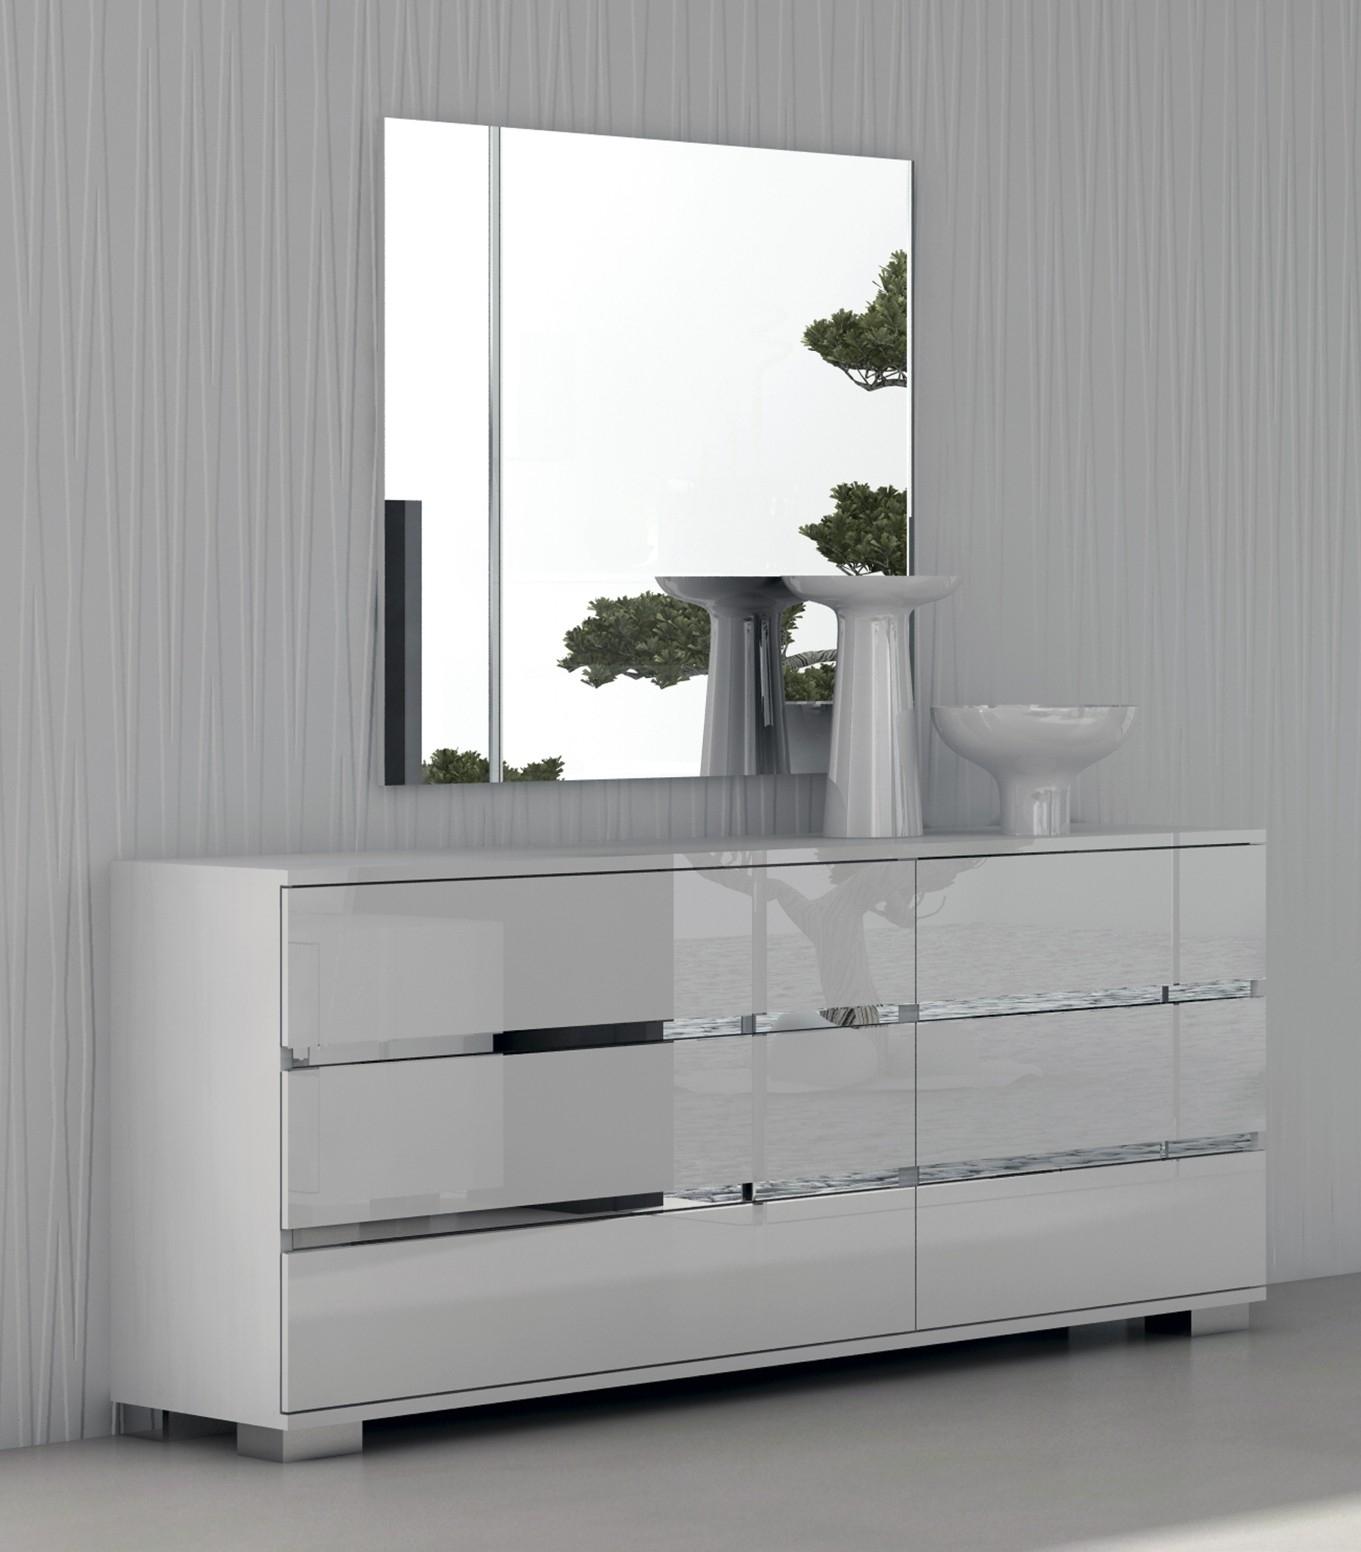 White Contemporary Dresser With Regard To Contemporary White Mirror (Image 14 of 15)